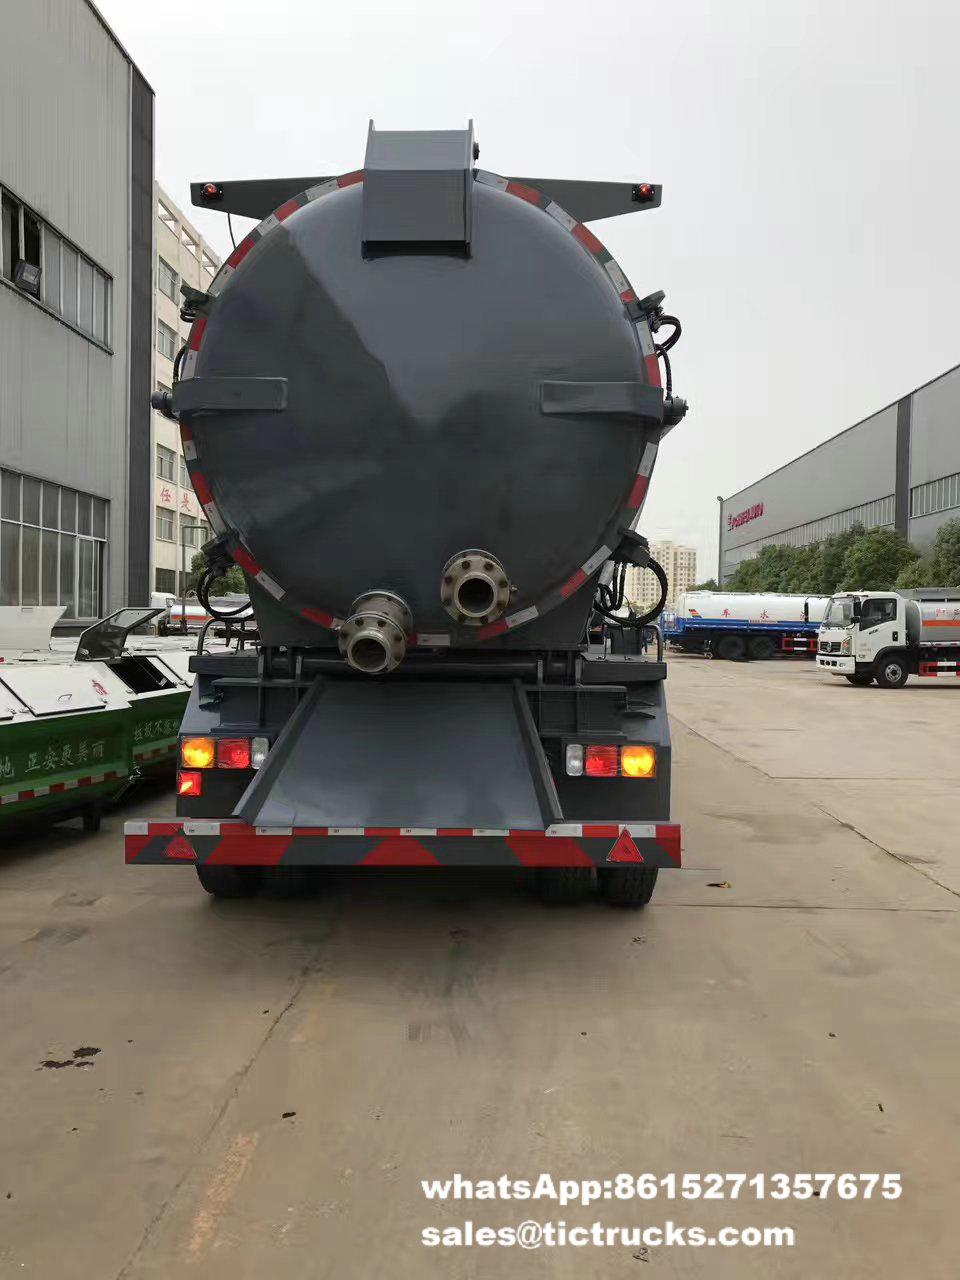 vaccum tanker-trailer-004-_1.jpg